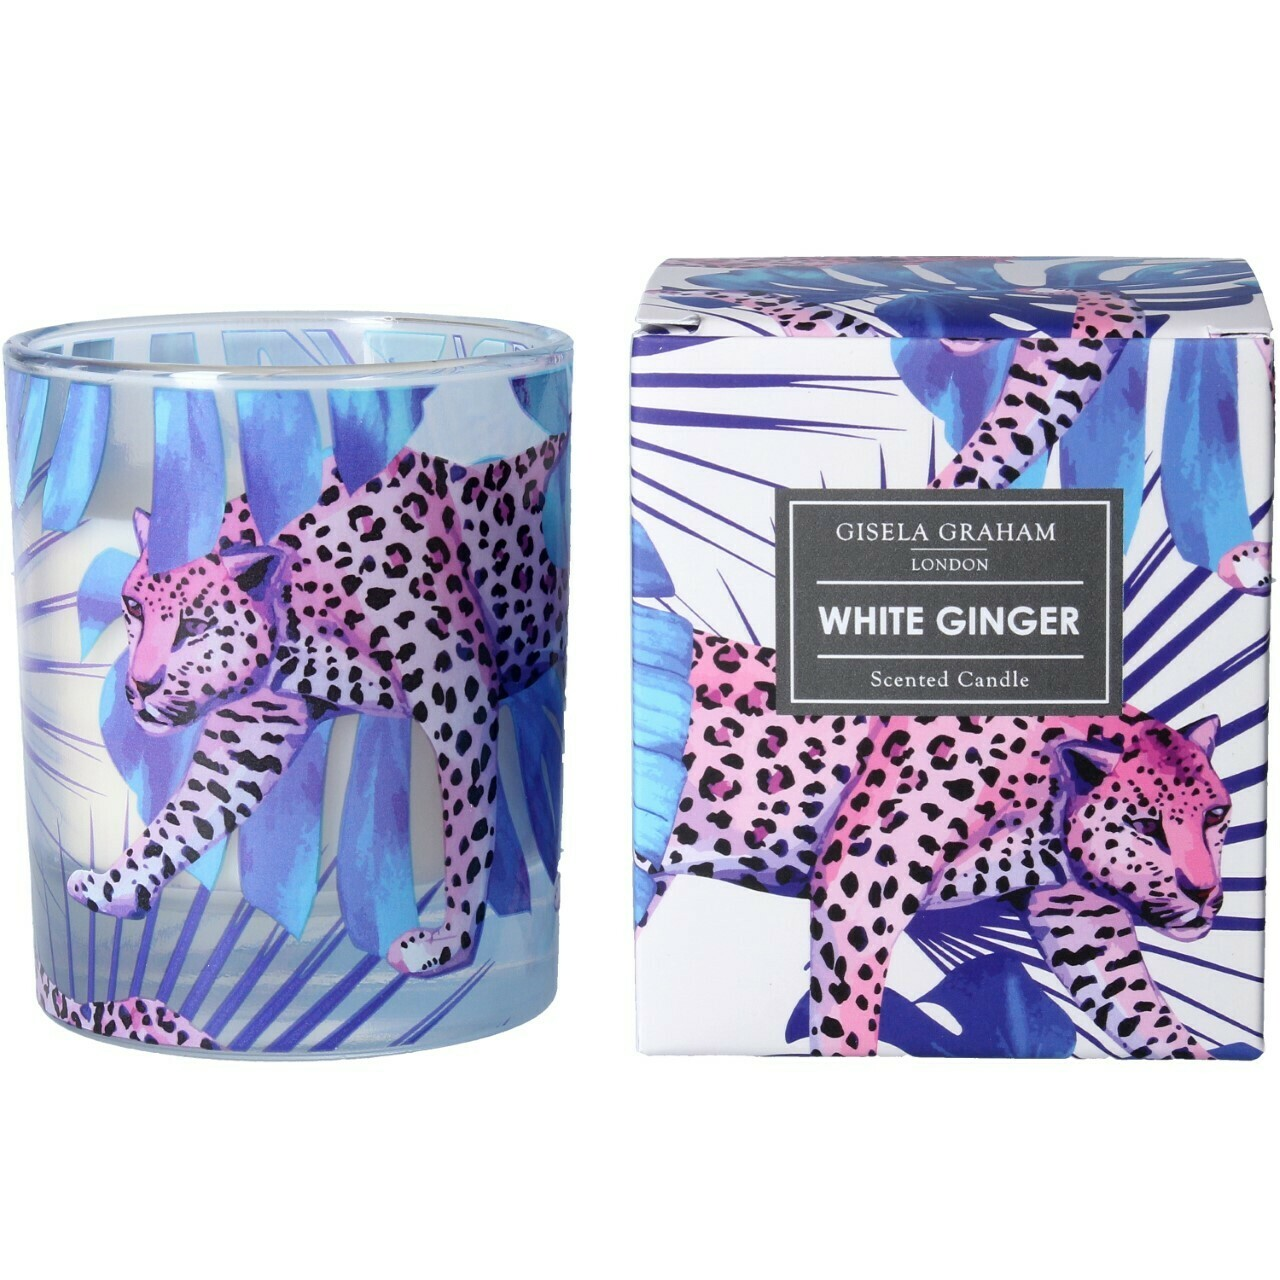 Gisela Graham Leopard Design White Ginger Scented Candle (40 hours)